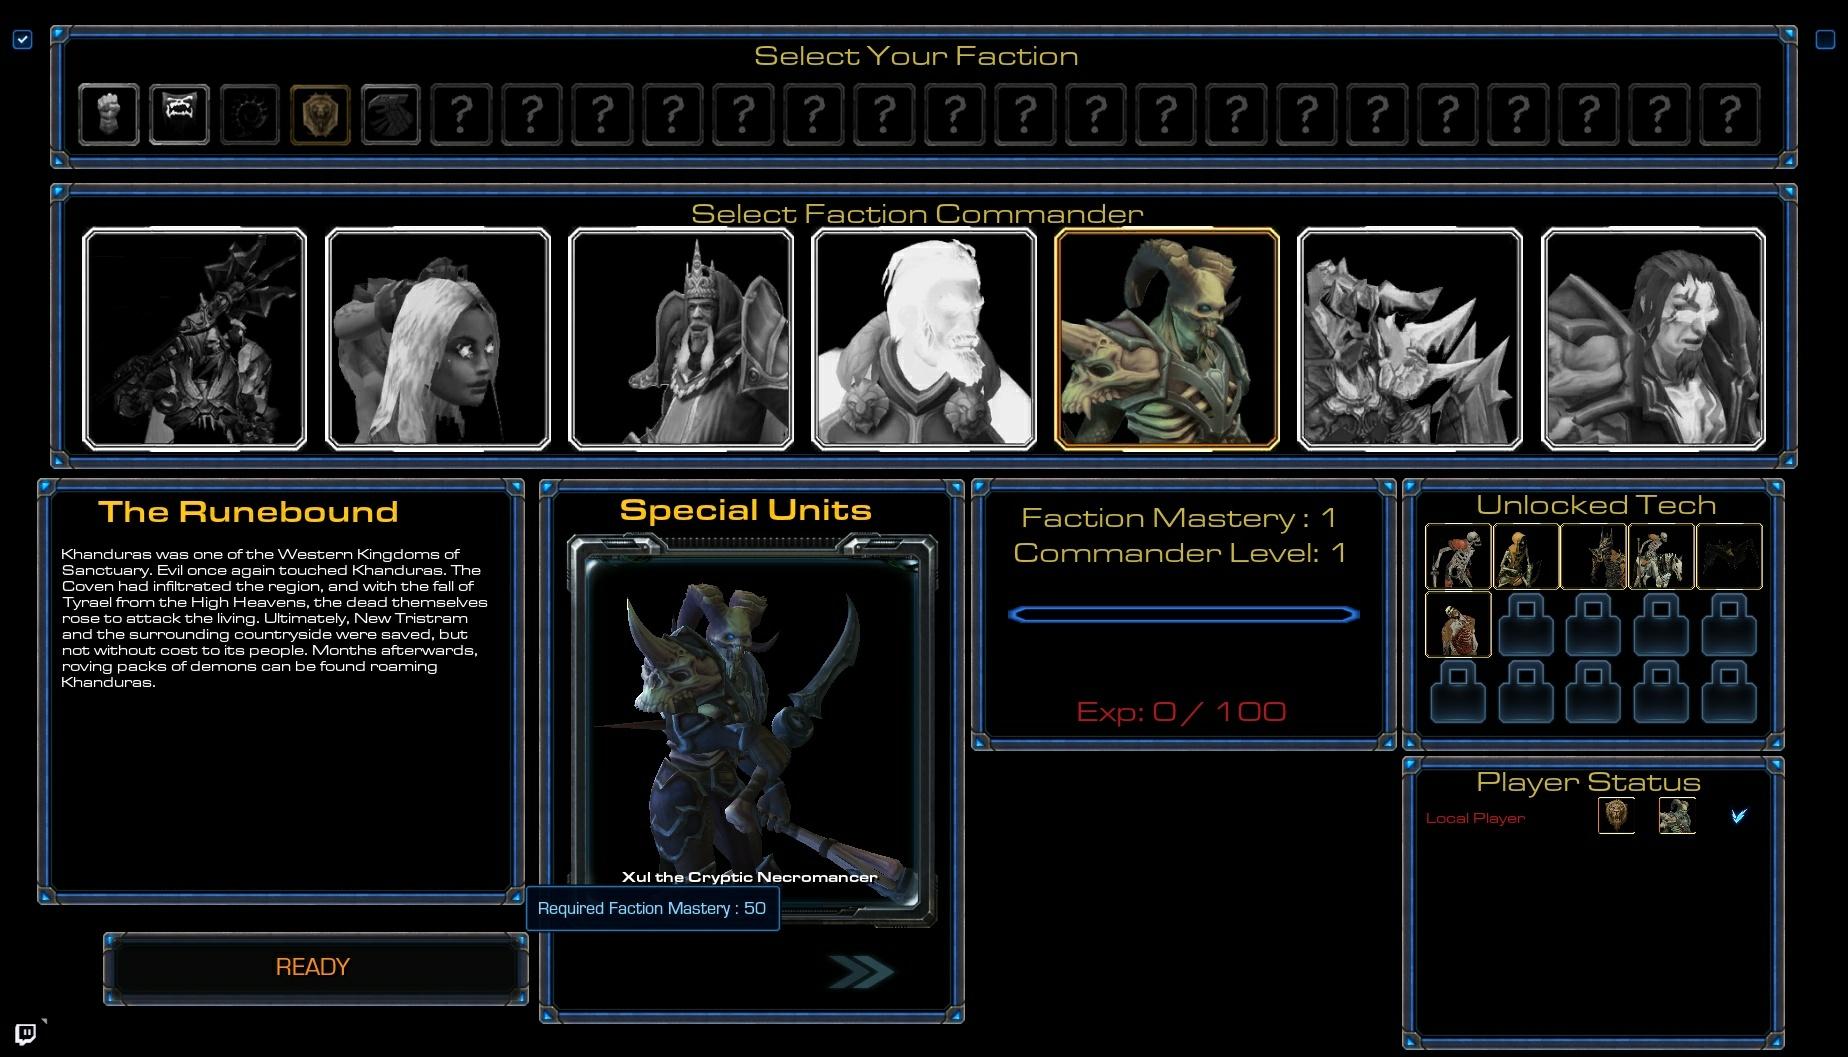 Xul the Necromancer